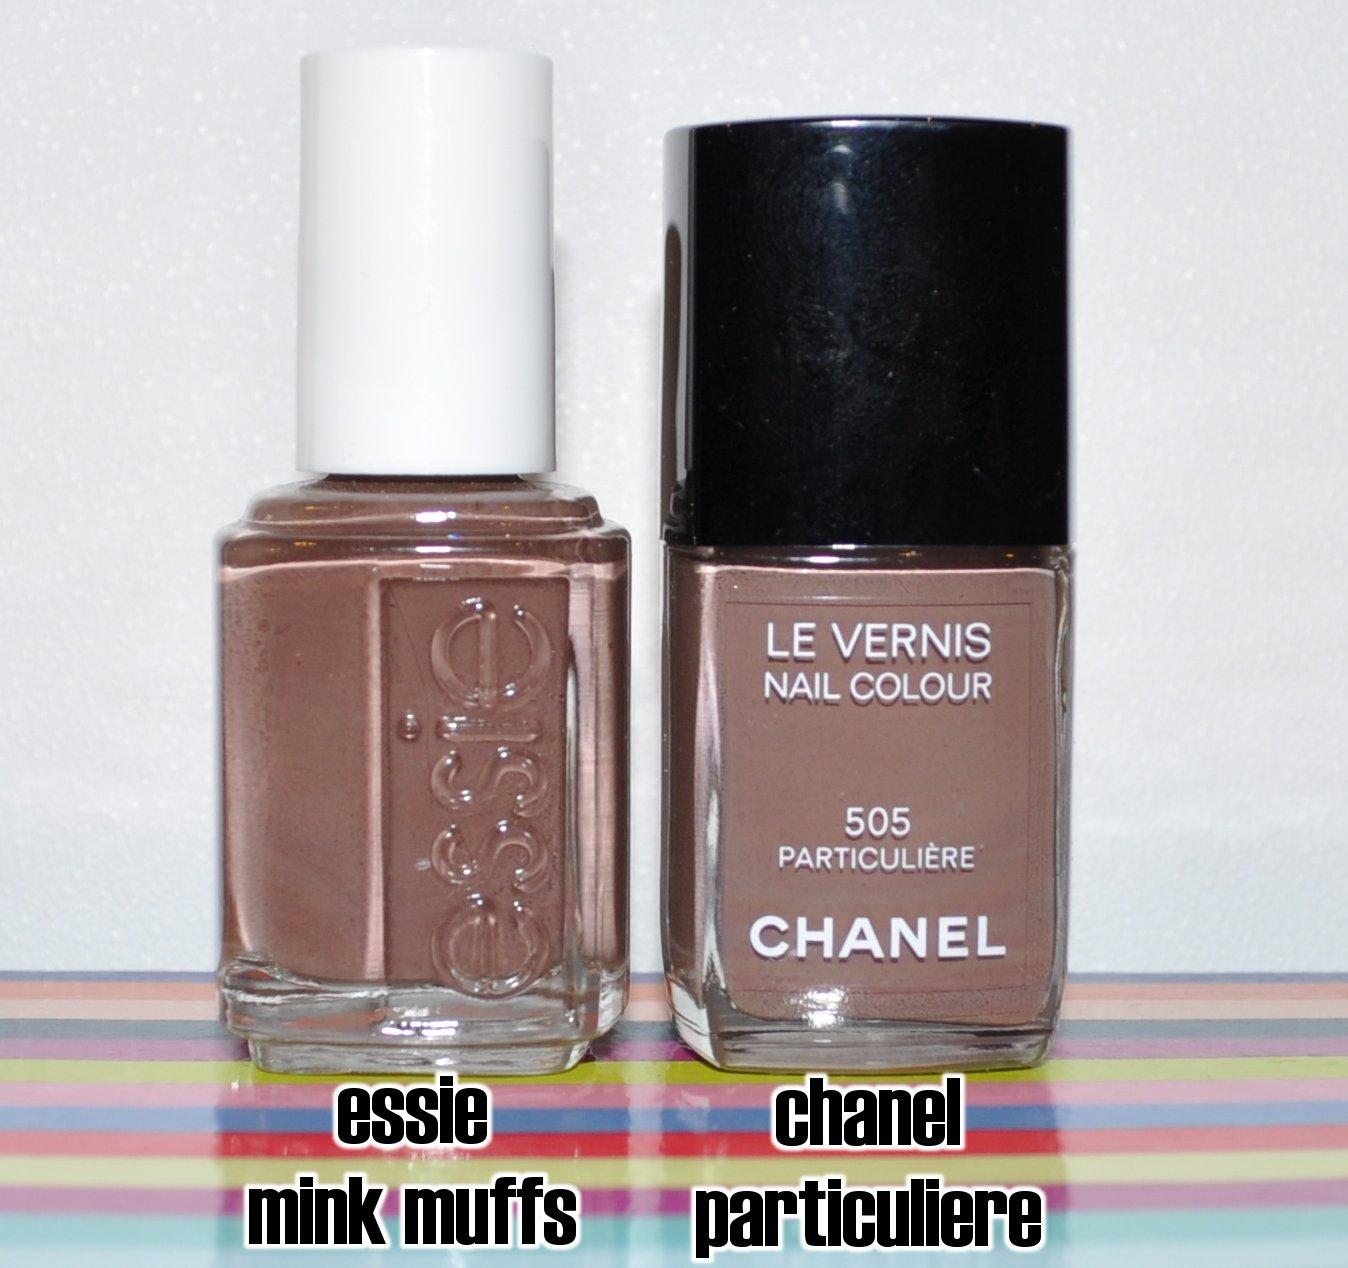 thatleanne chanel particuliere vs essie mink muffs. Black Bedroom Furniture Sets. Home Design Ideas